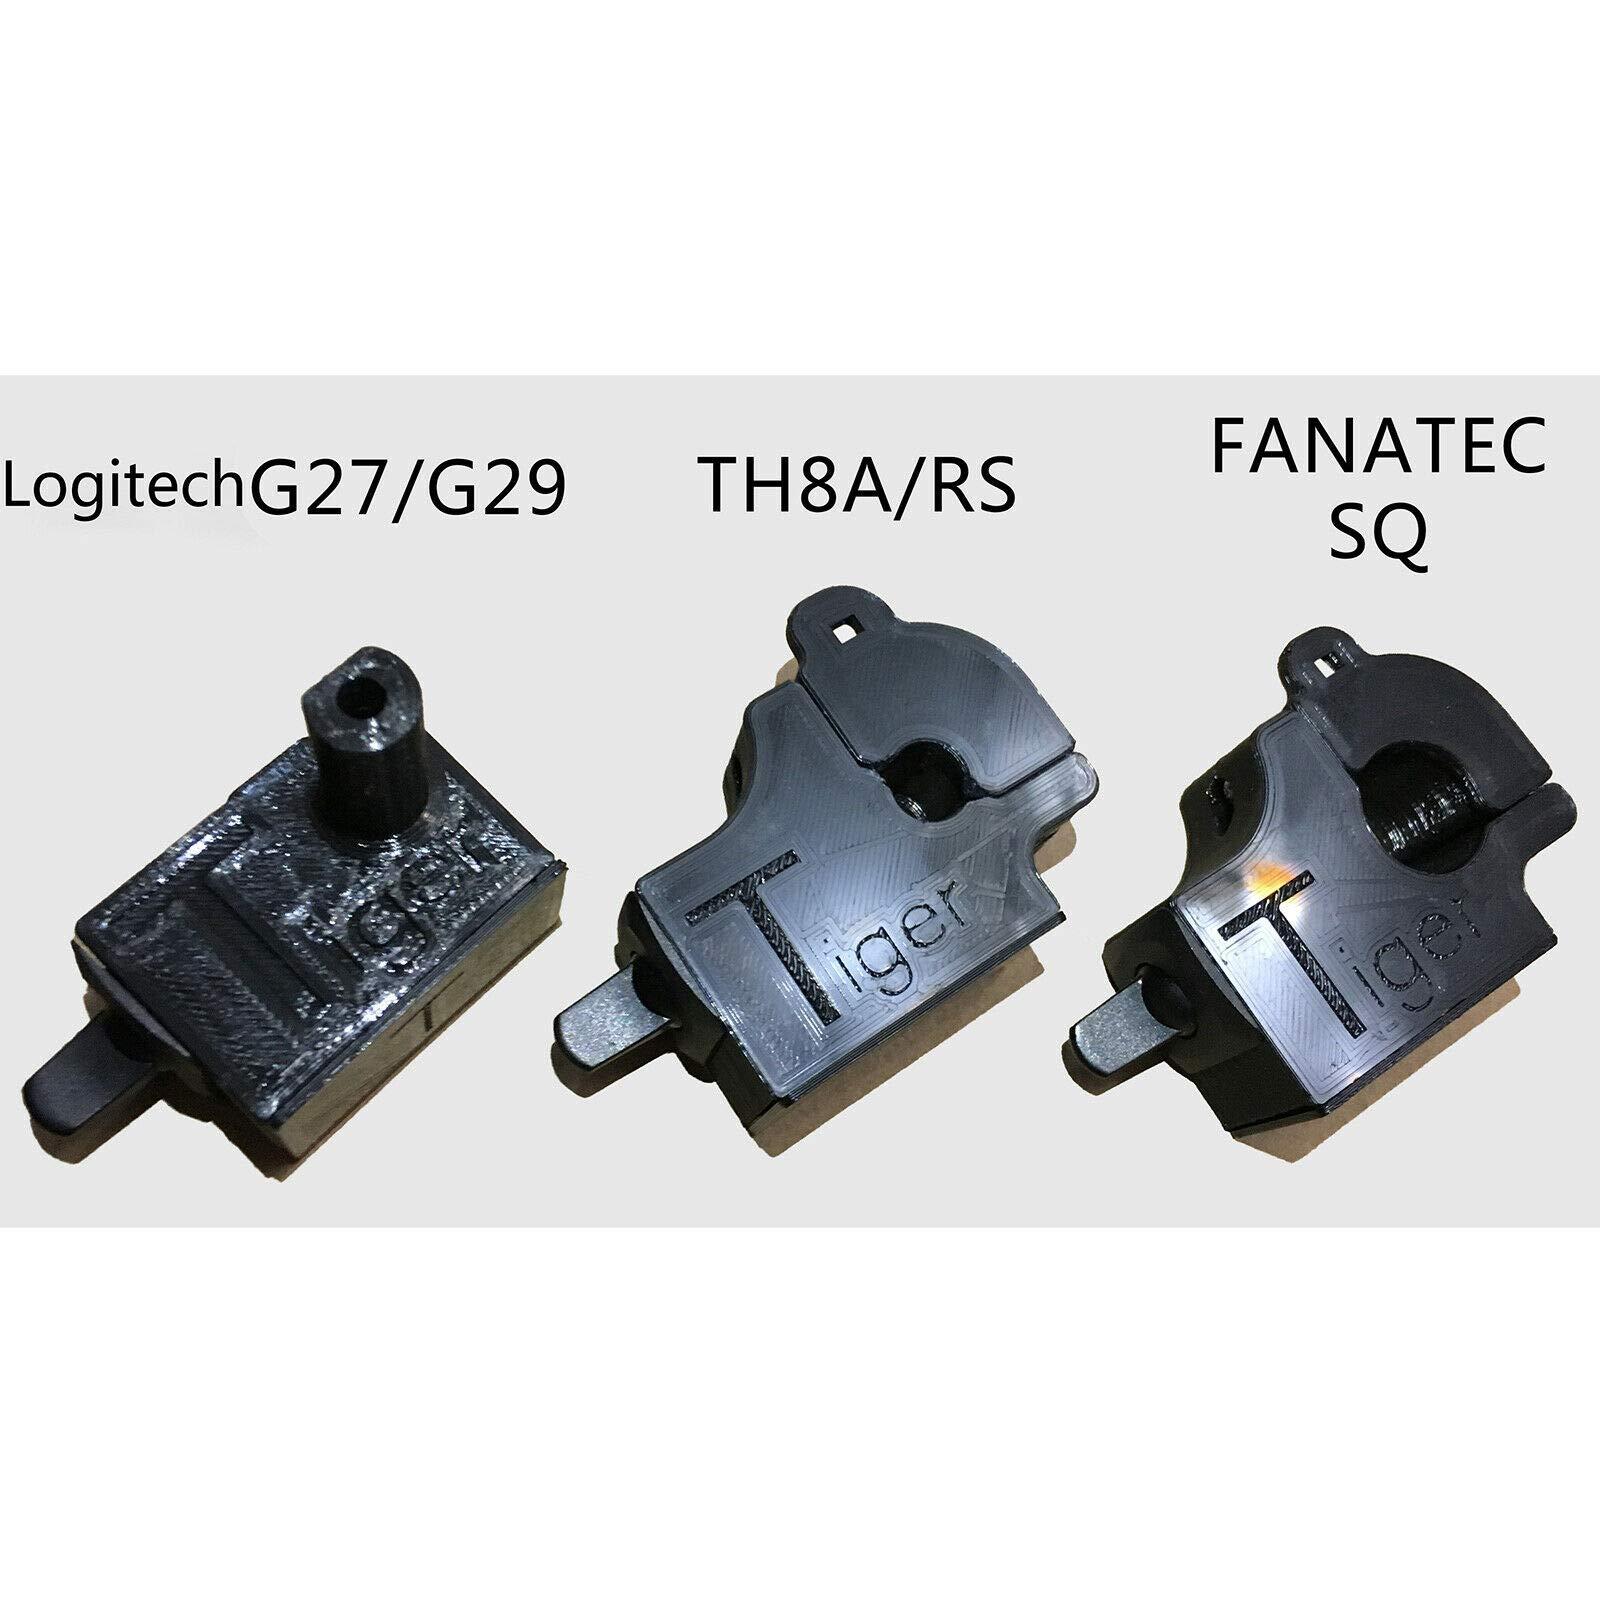 aikeec Mini 16 Speed Gearshift Shifter Module for Logitech G25/G27/G29/TH8A/FANATEC SQ